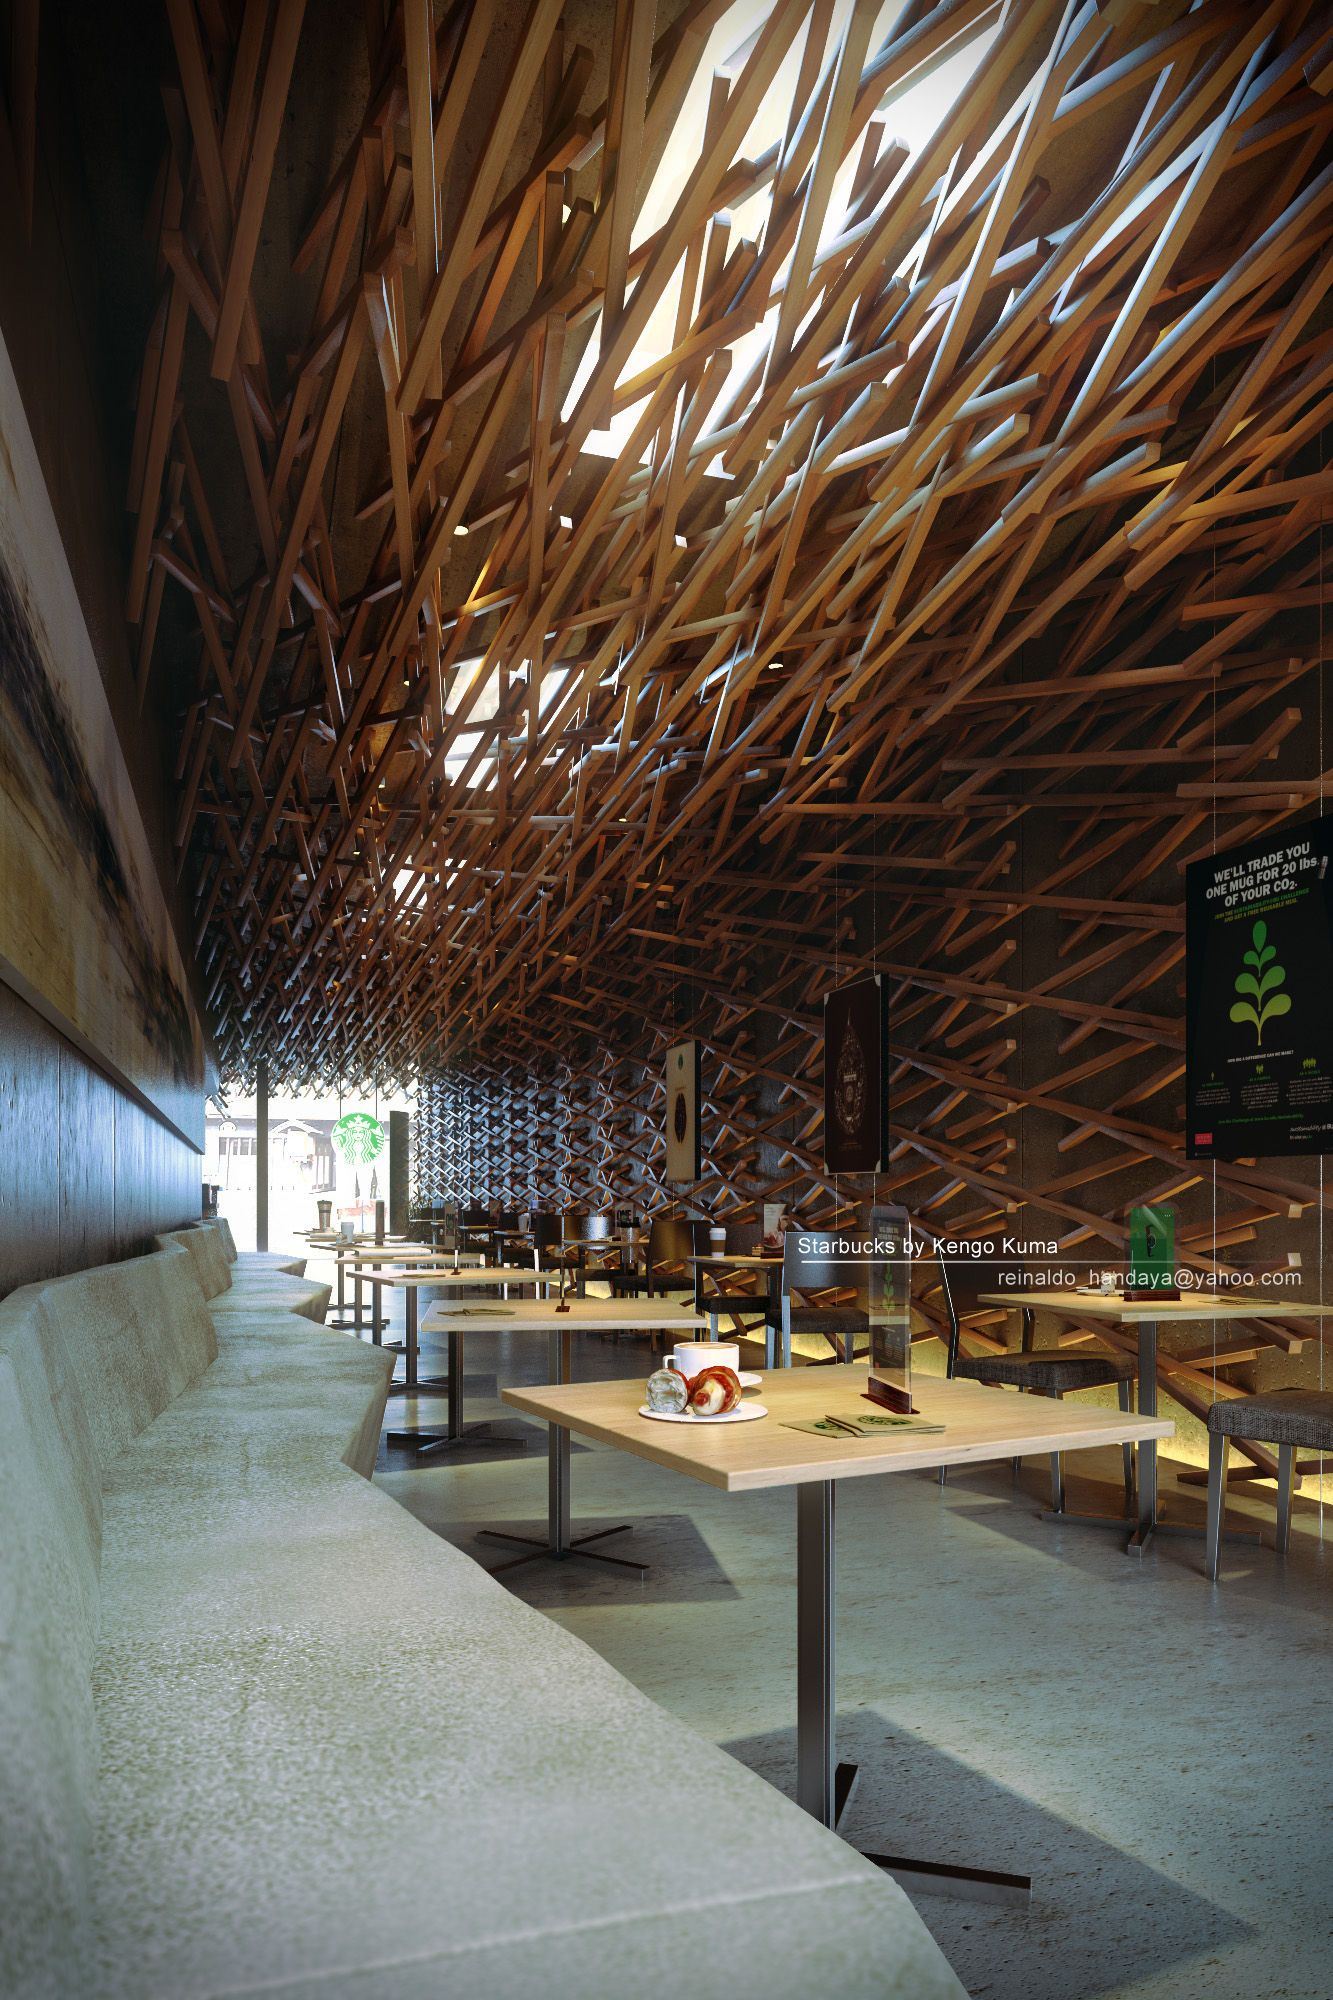 Starbucks by Kengo Kuma Part 2